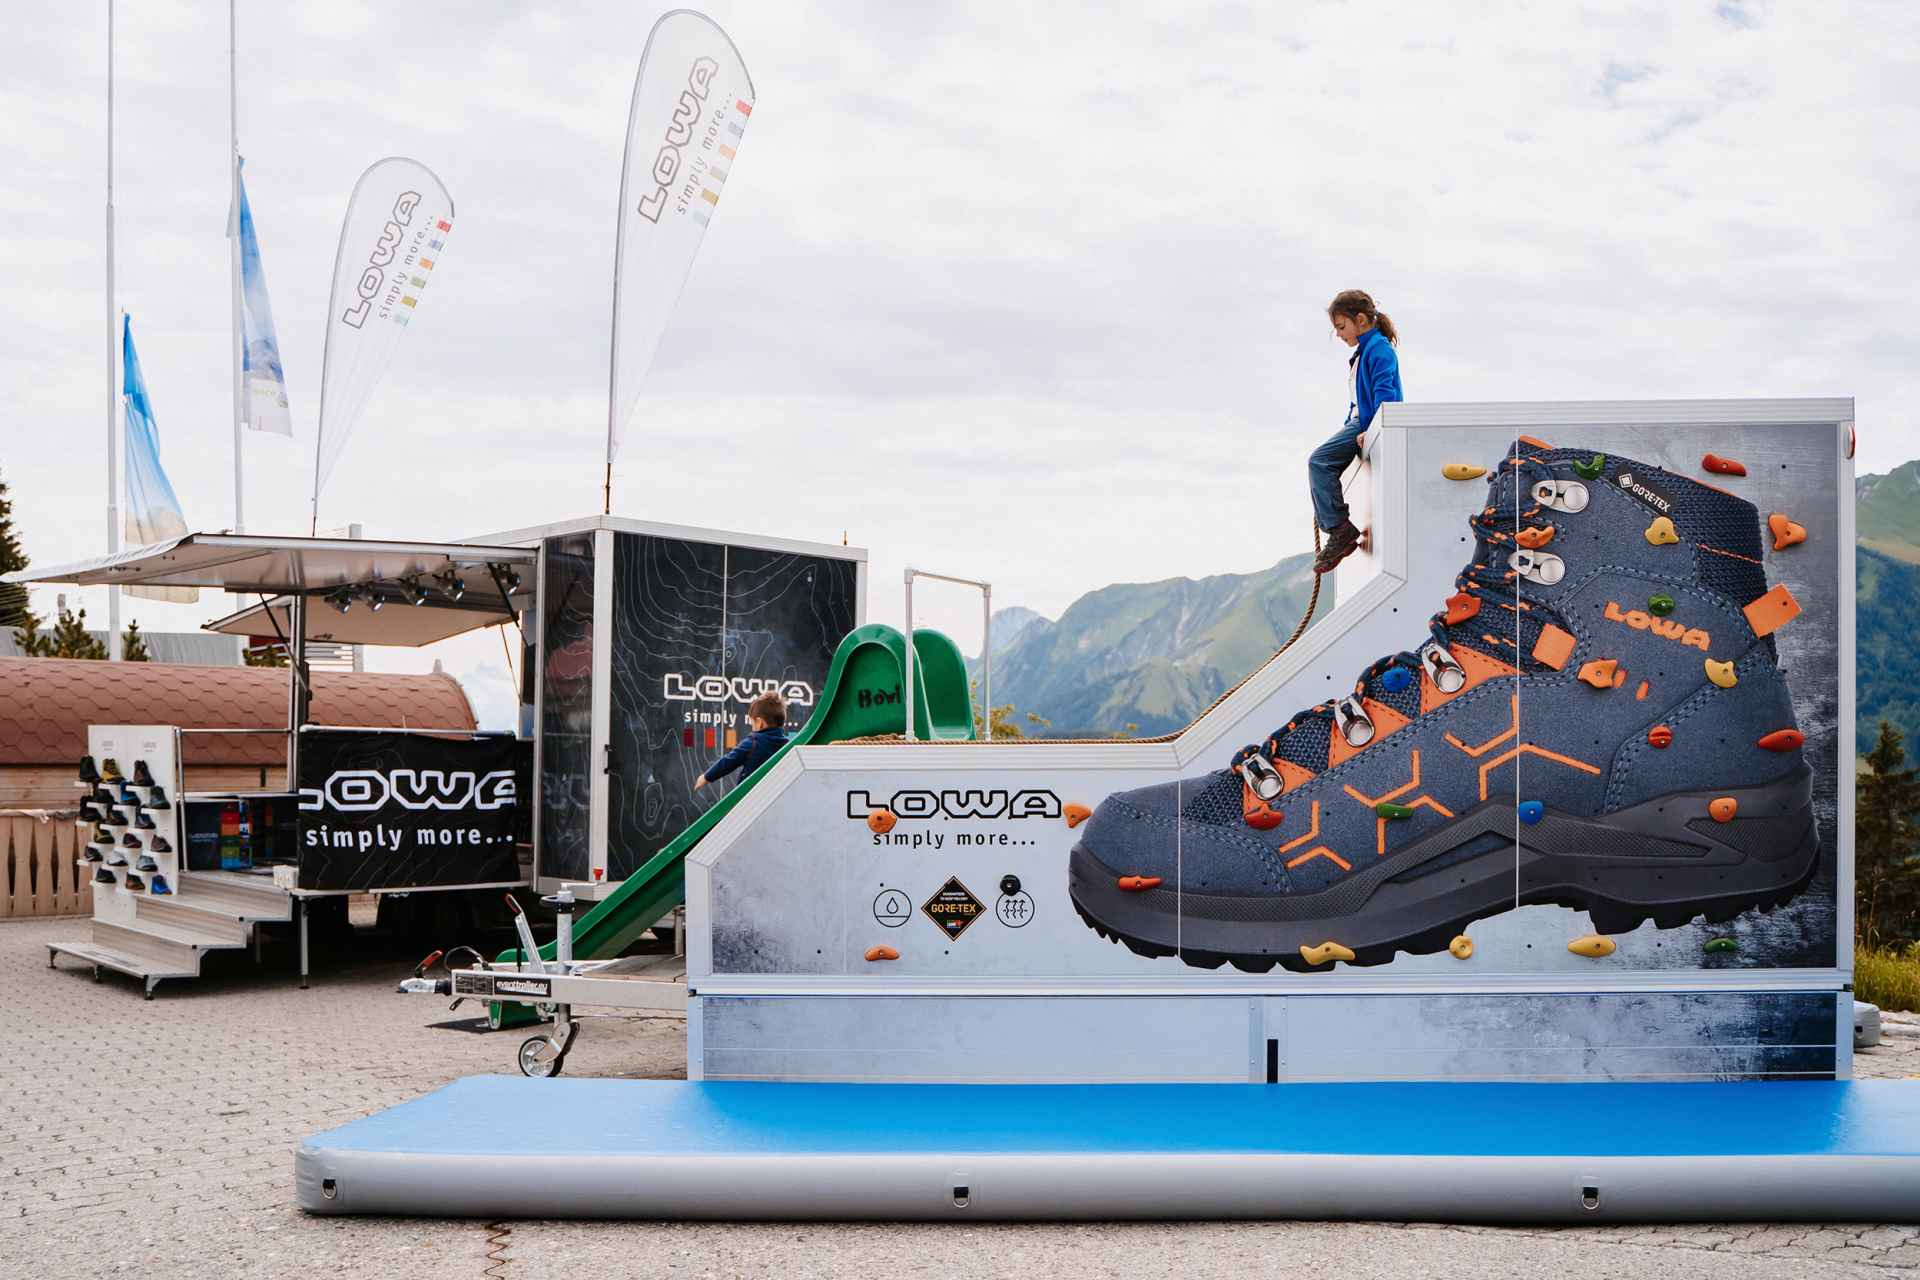 2021_lowa-schweiz_event-trailer-kids-mobil_lowaschuh-testivalgurnigel-35